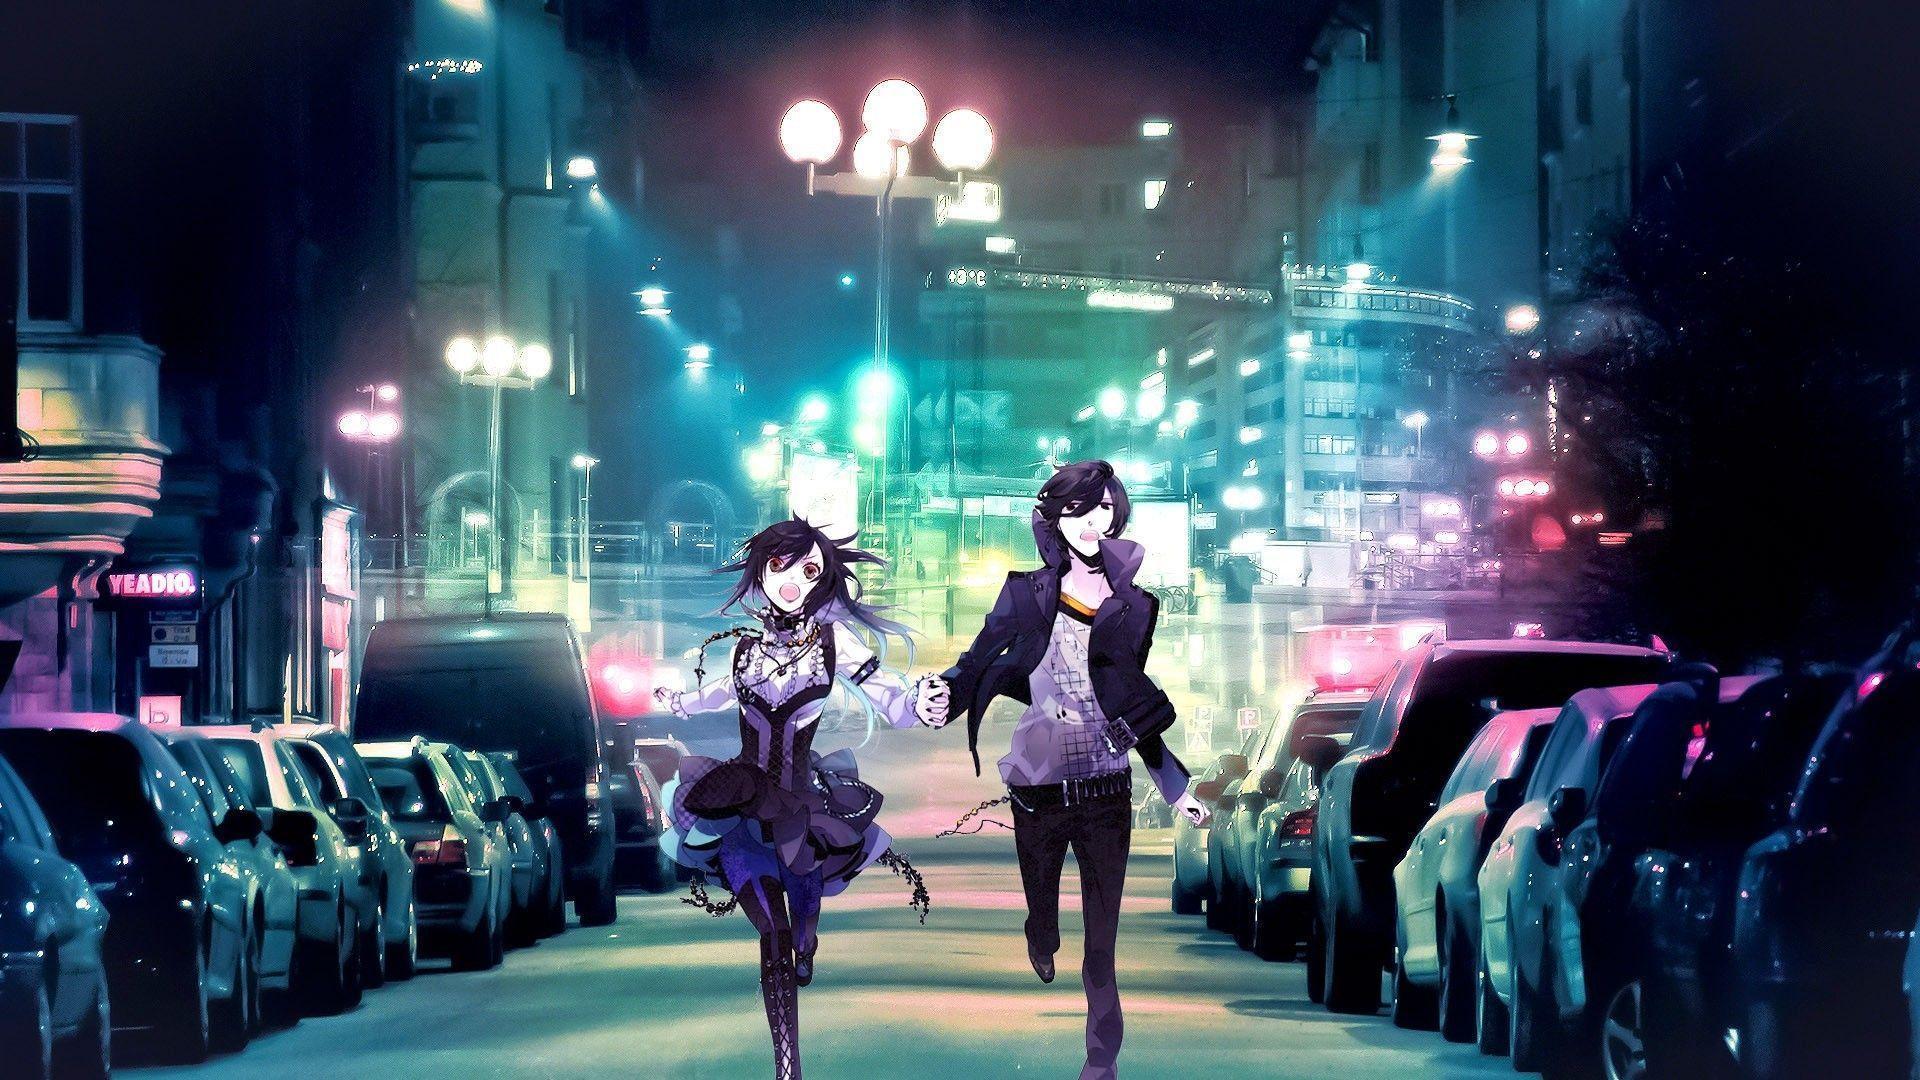 romantic anime wallpaper - photo #13